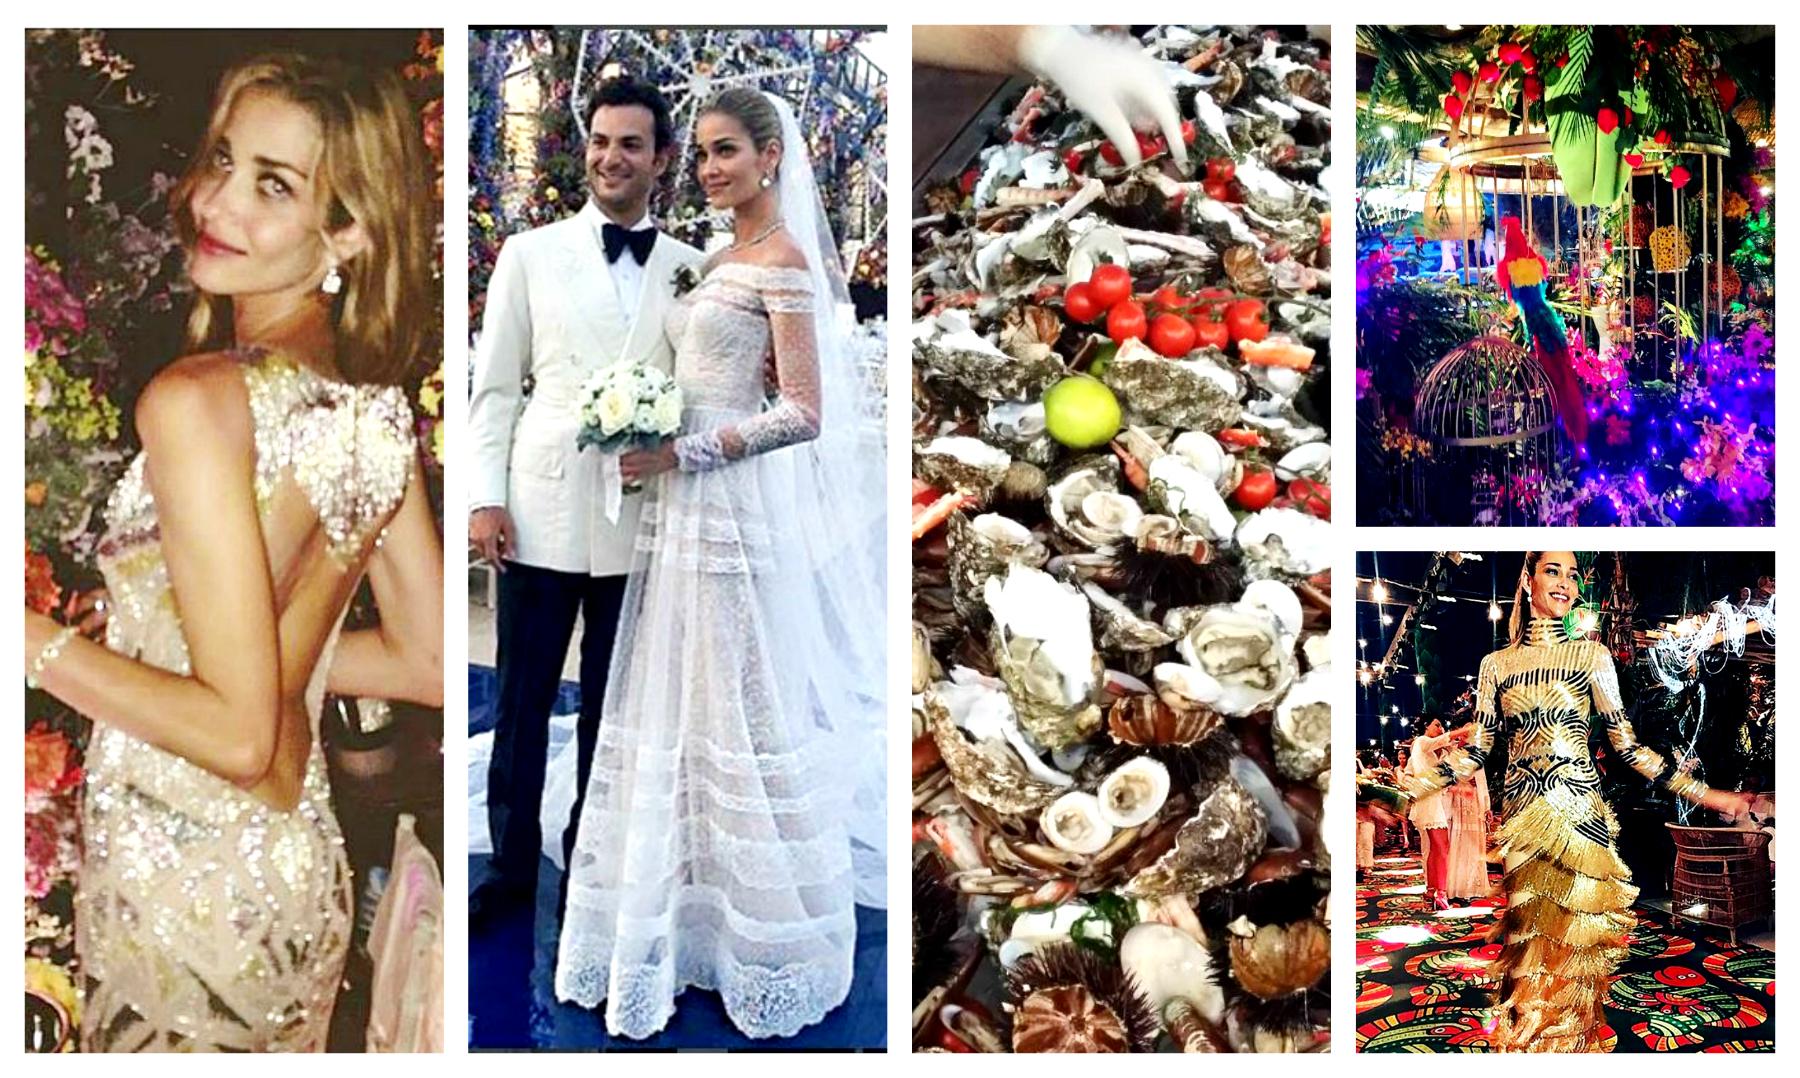 5050c3ff4e69 Βούλιαξε η Μύκονος  Χλιδή 5 εκατ. ευρώ στο πάρτι γάμου της Barros  photos